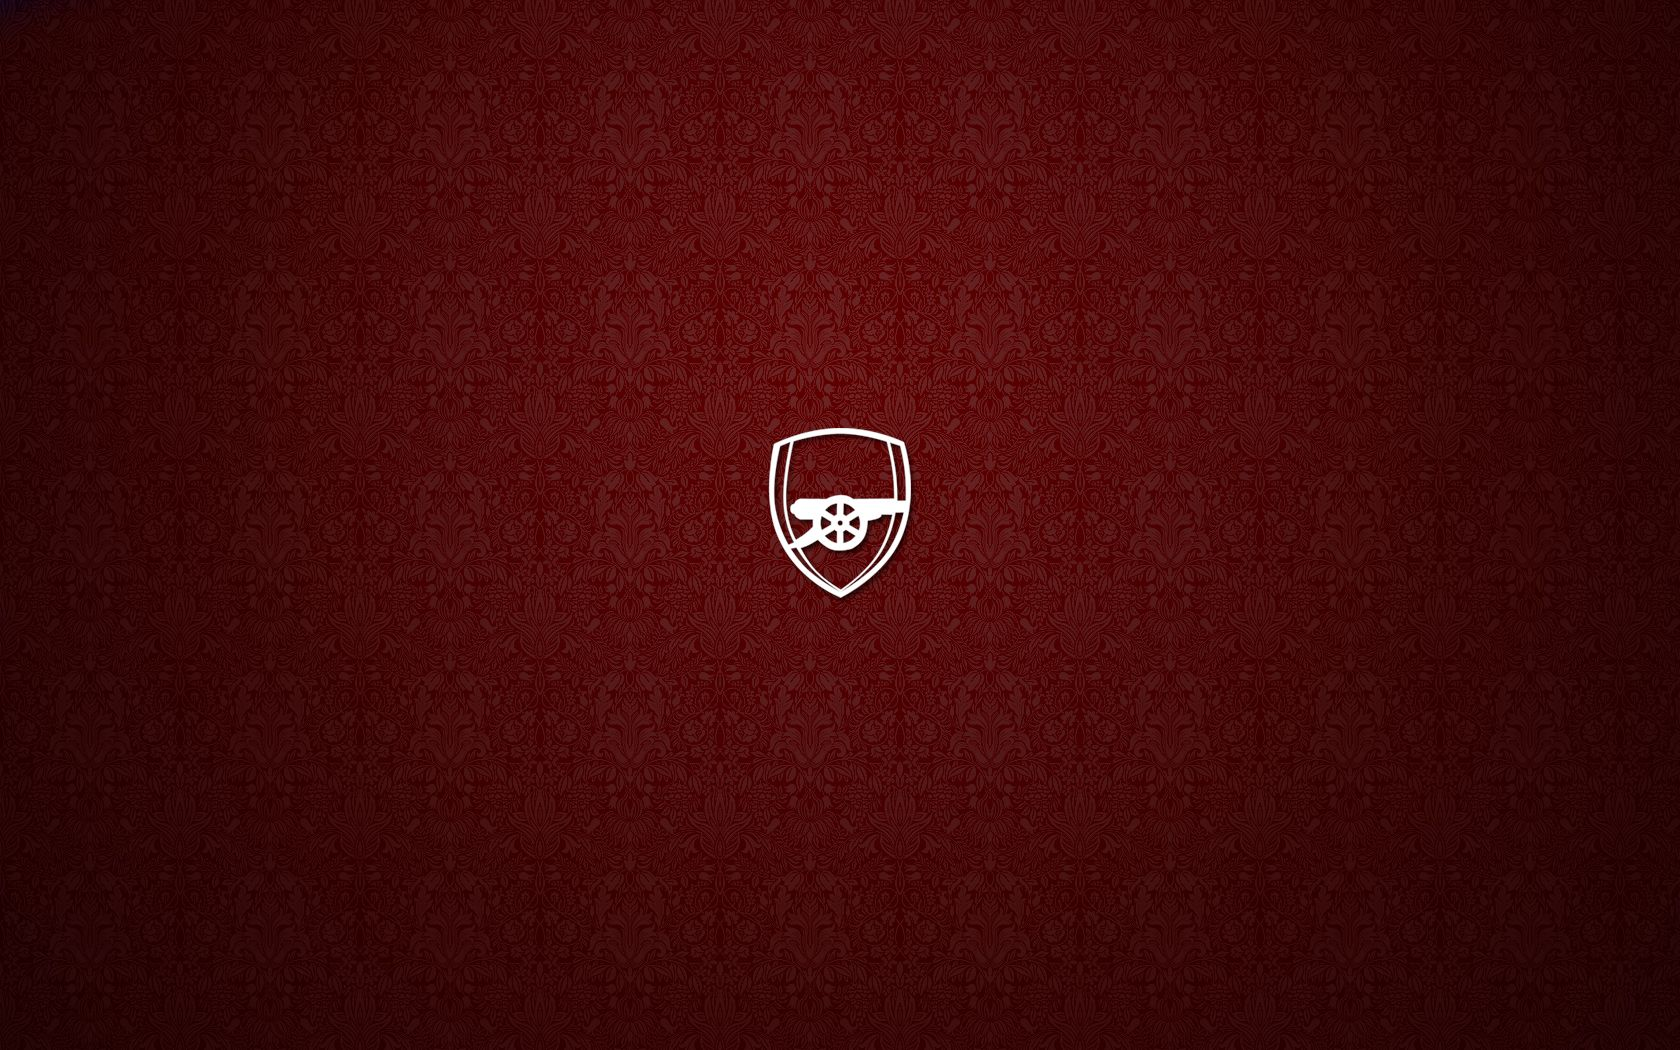 Arsenal Minimalist Wallpaper